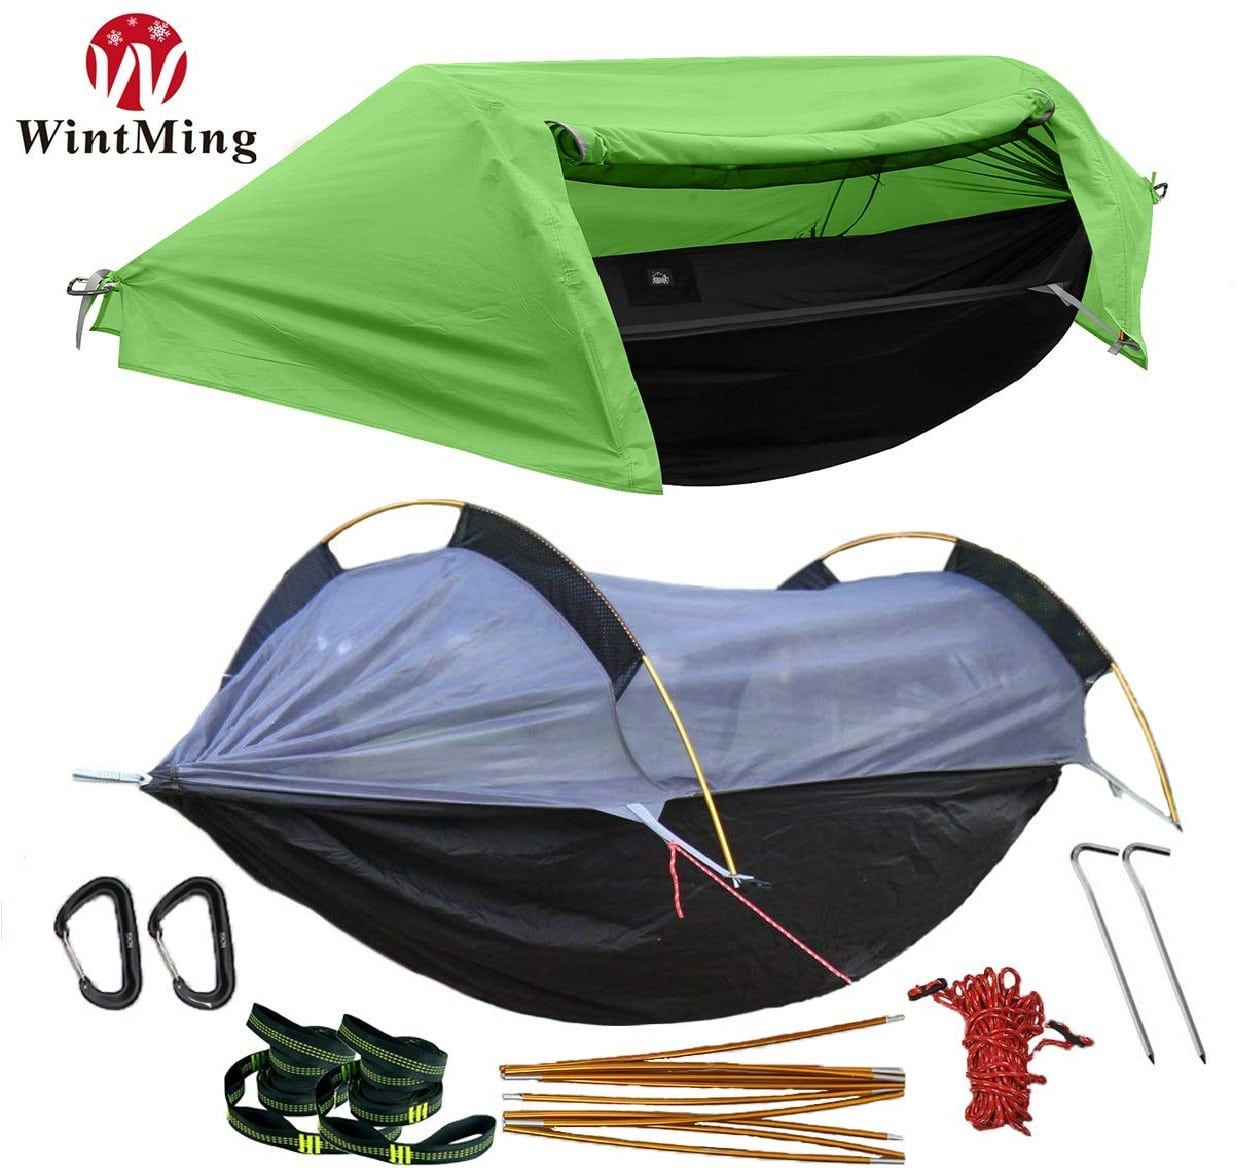 6.WintMing Patent Camping Hammock